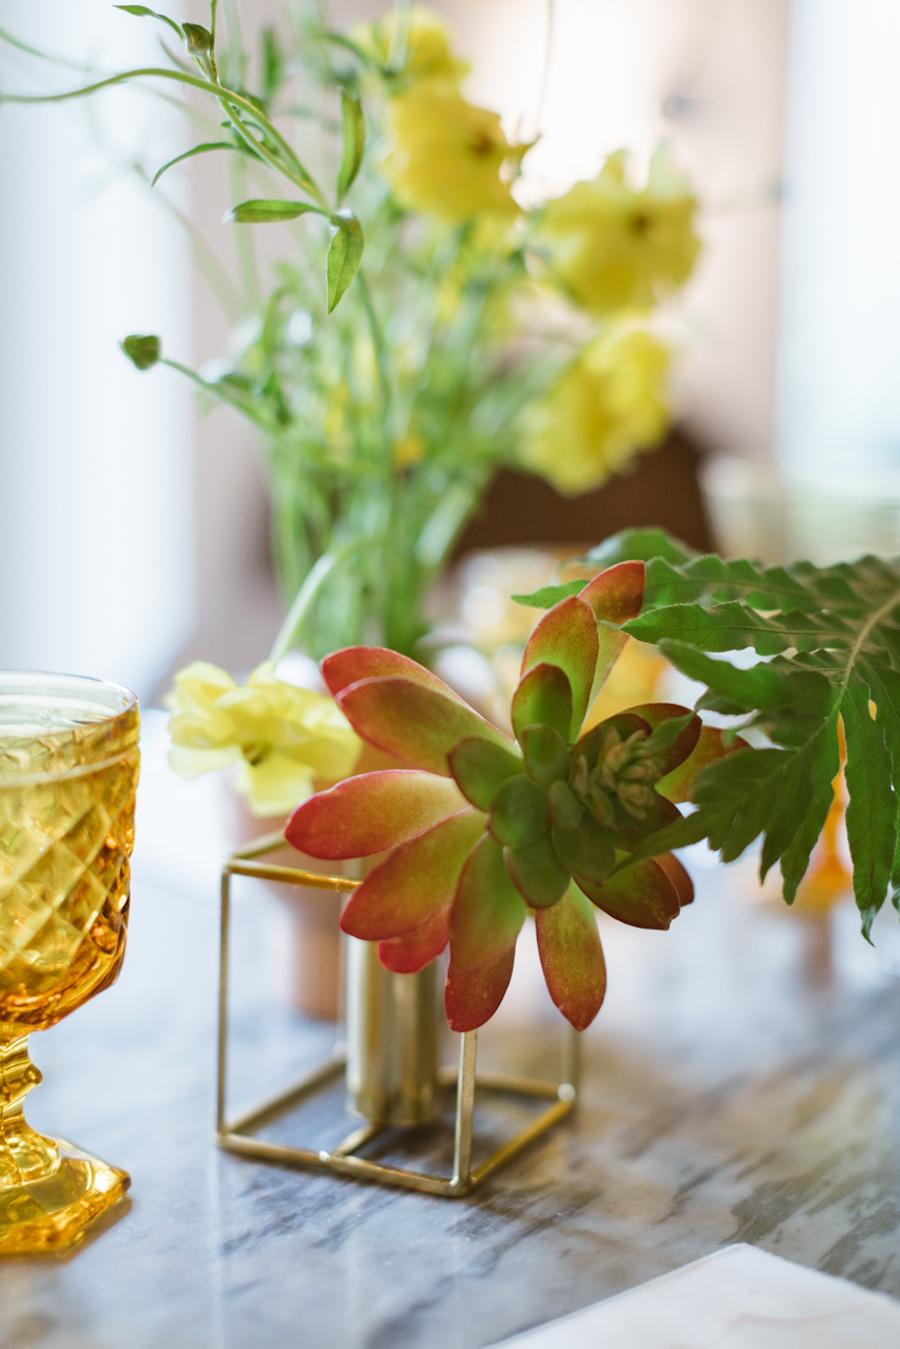 centrotavola con piante succulente